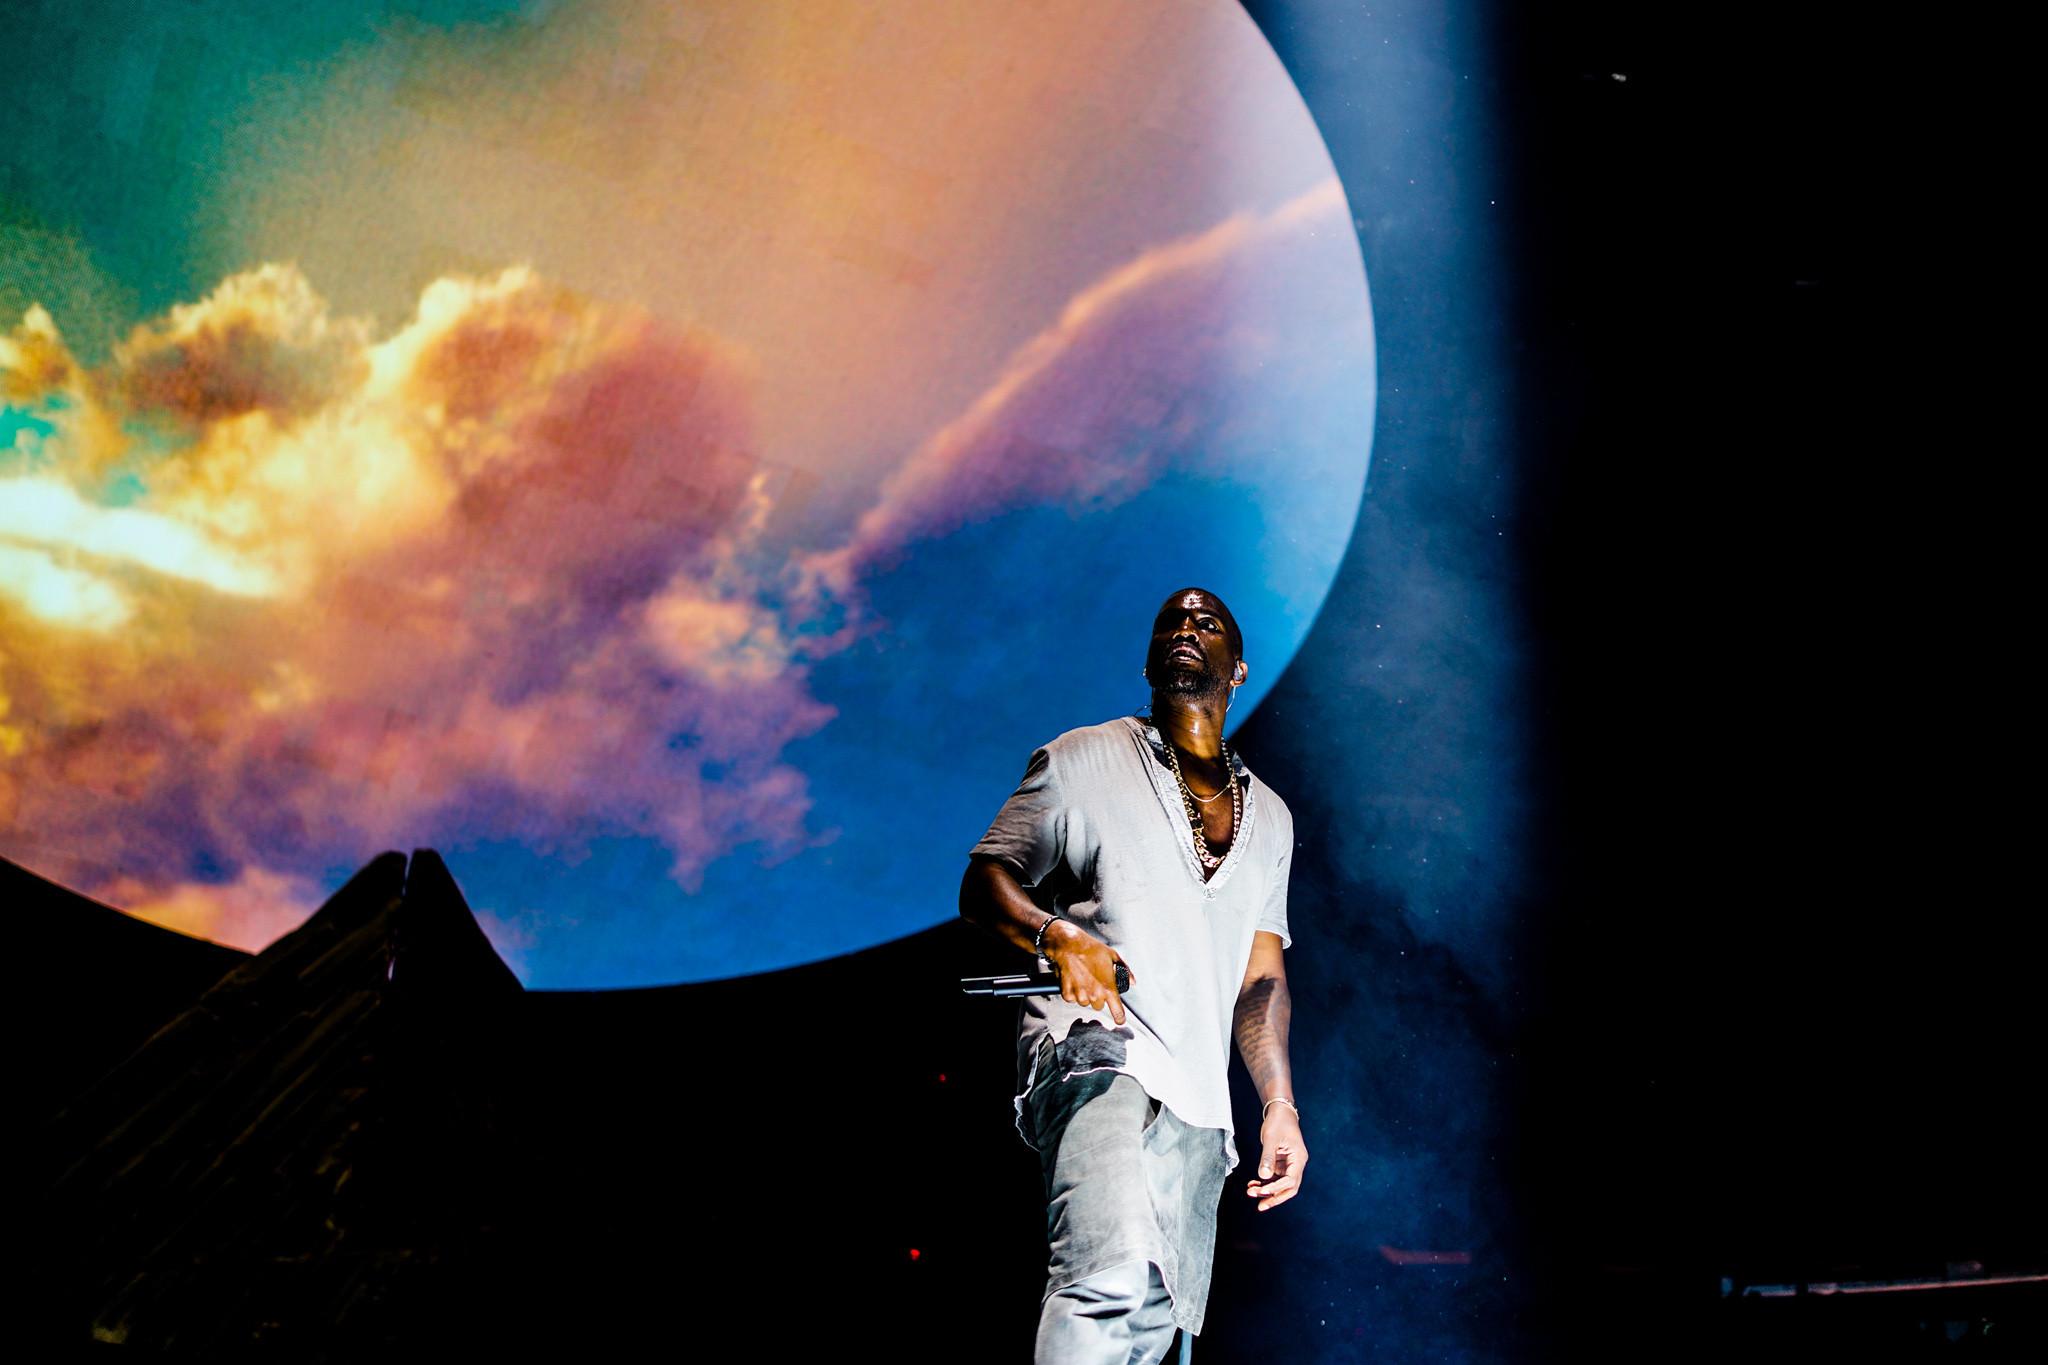 HD YEEZUS Tour Wallpapers (Desktop Phone) [UPDATED!!] Â« Kanye